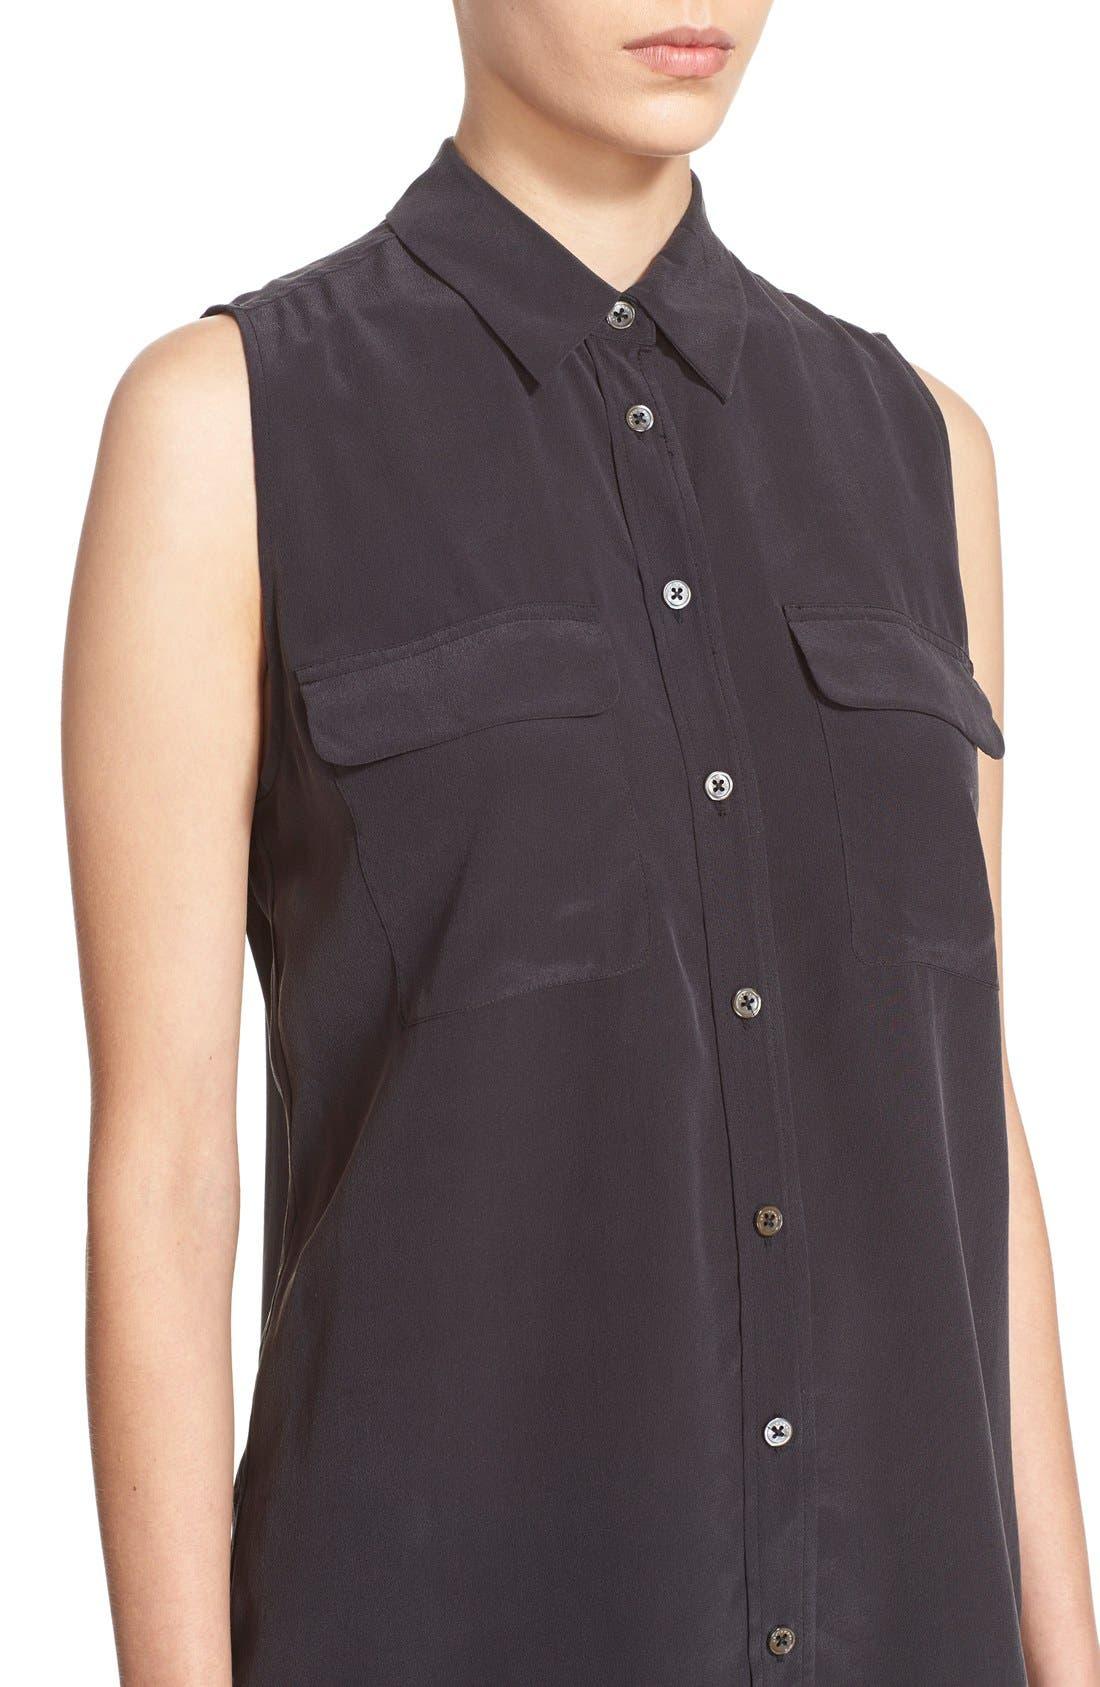 'Slim Signature' Sleeveless Silk Shirt,                             Alternate thumbnail 148, color,